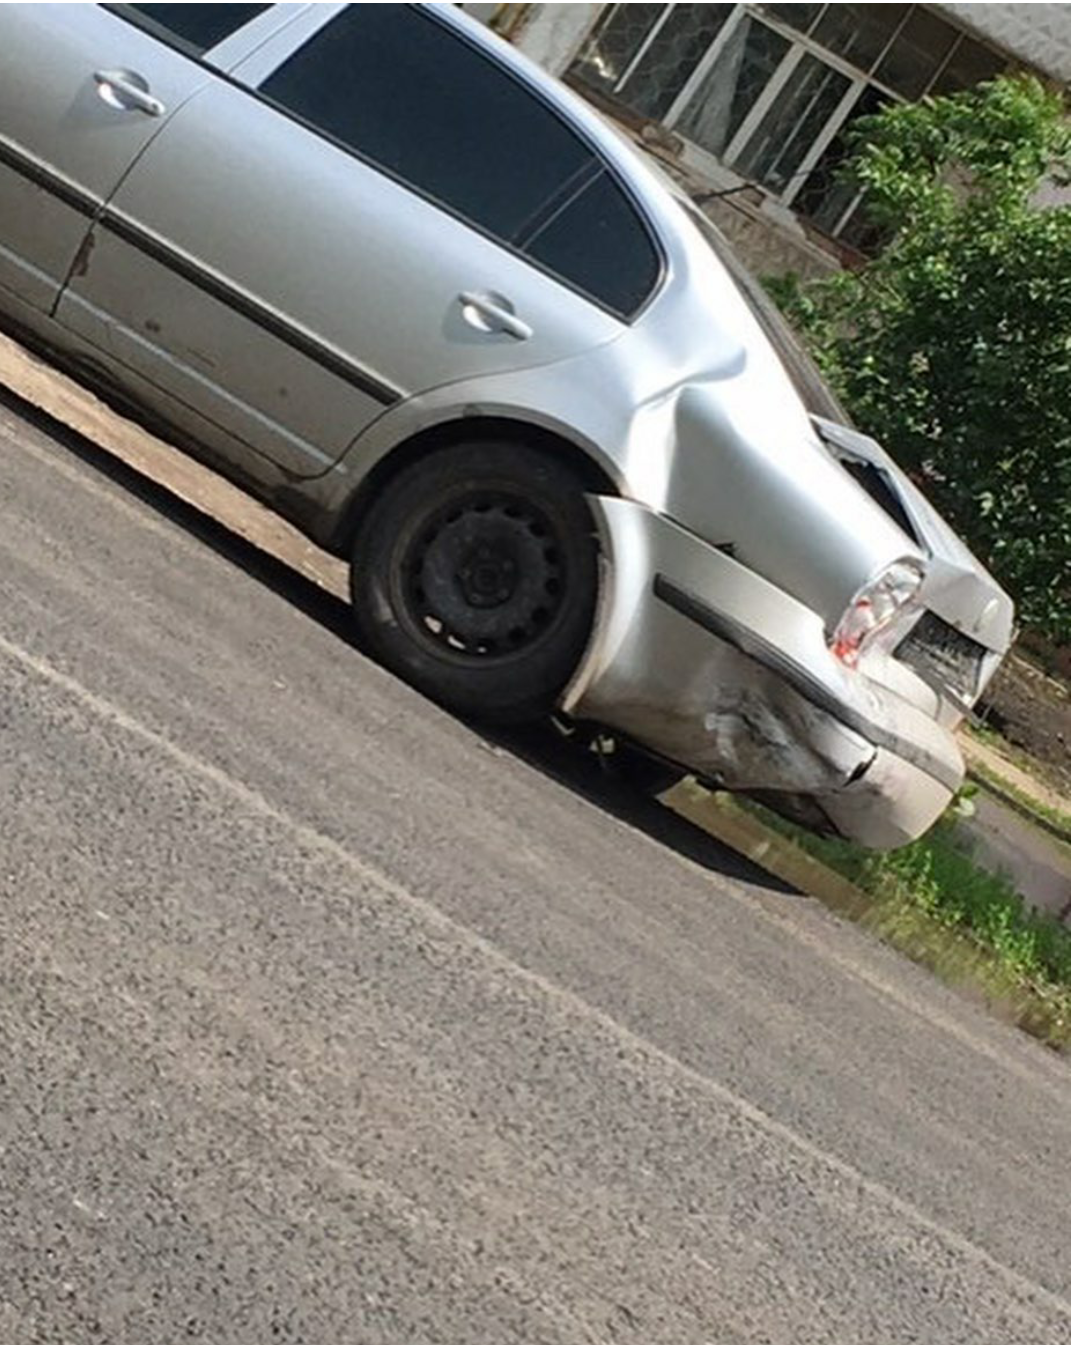 На одном участке дороги: на Лозовщине за один день случилось два ДТП(ФОТО), фото-1